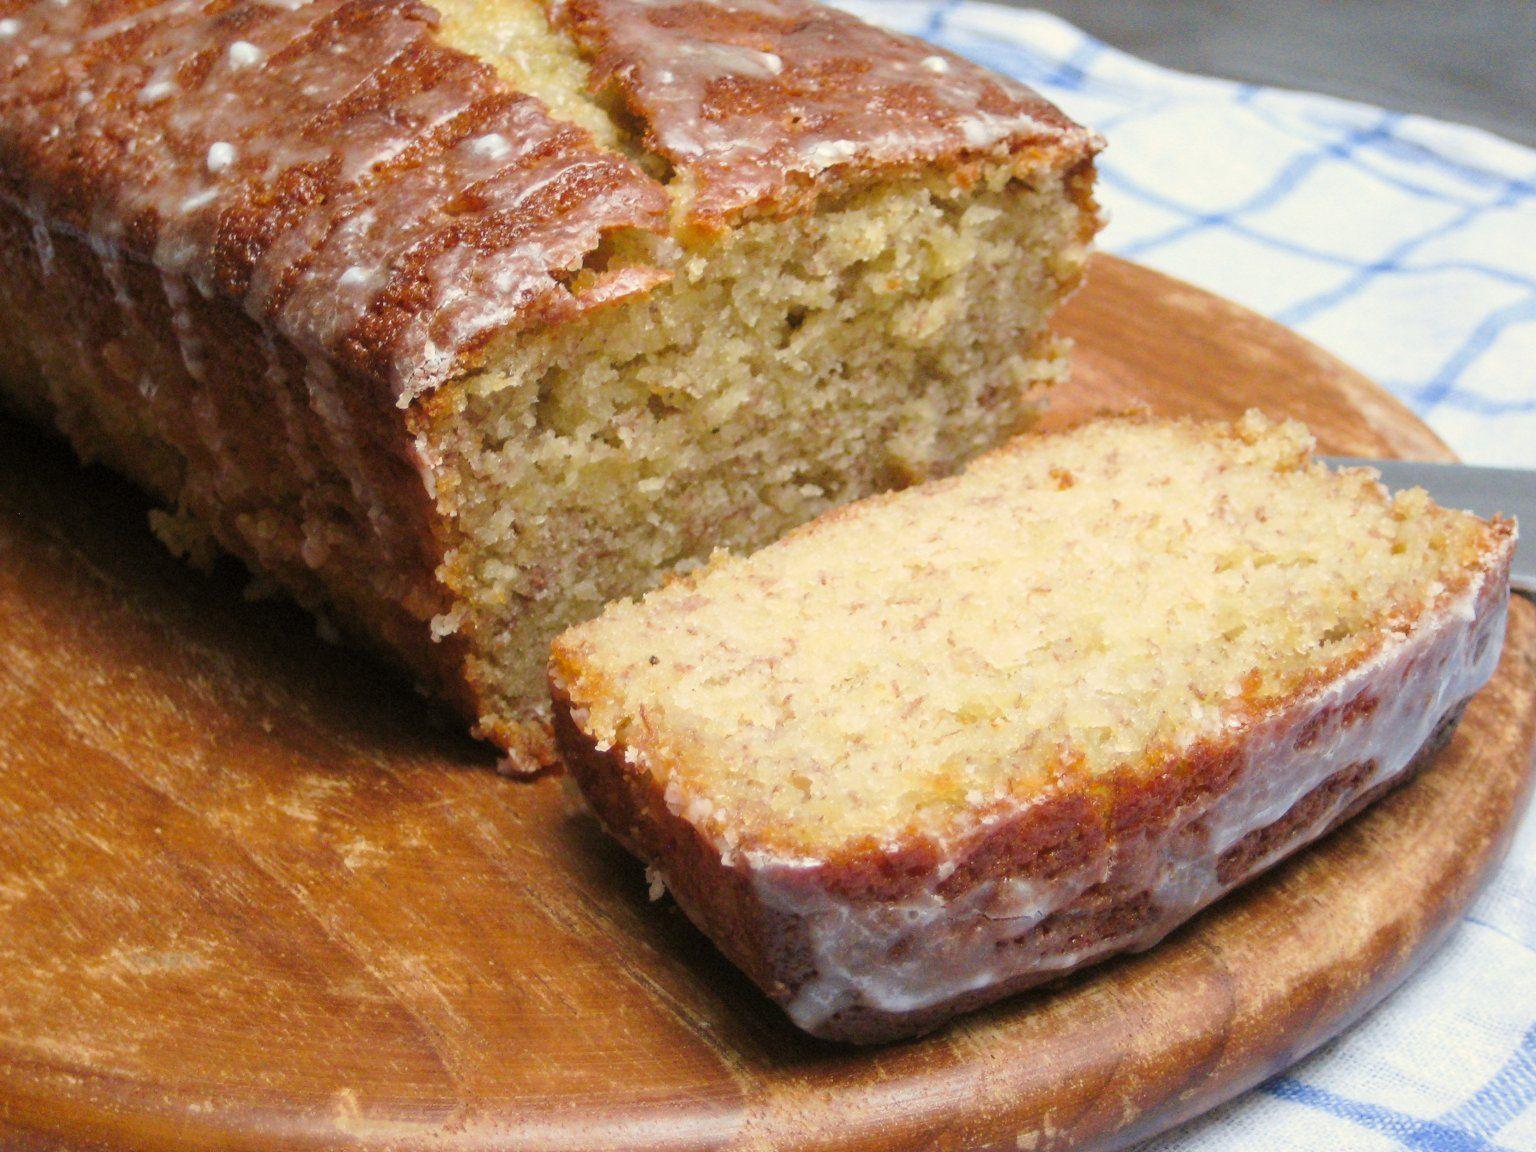 Buttermilk Banana Bread Birthday Cake No 1 Buttermilk Banana Bread Buttermilk Recipes Baking Recipes